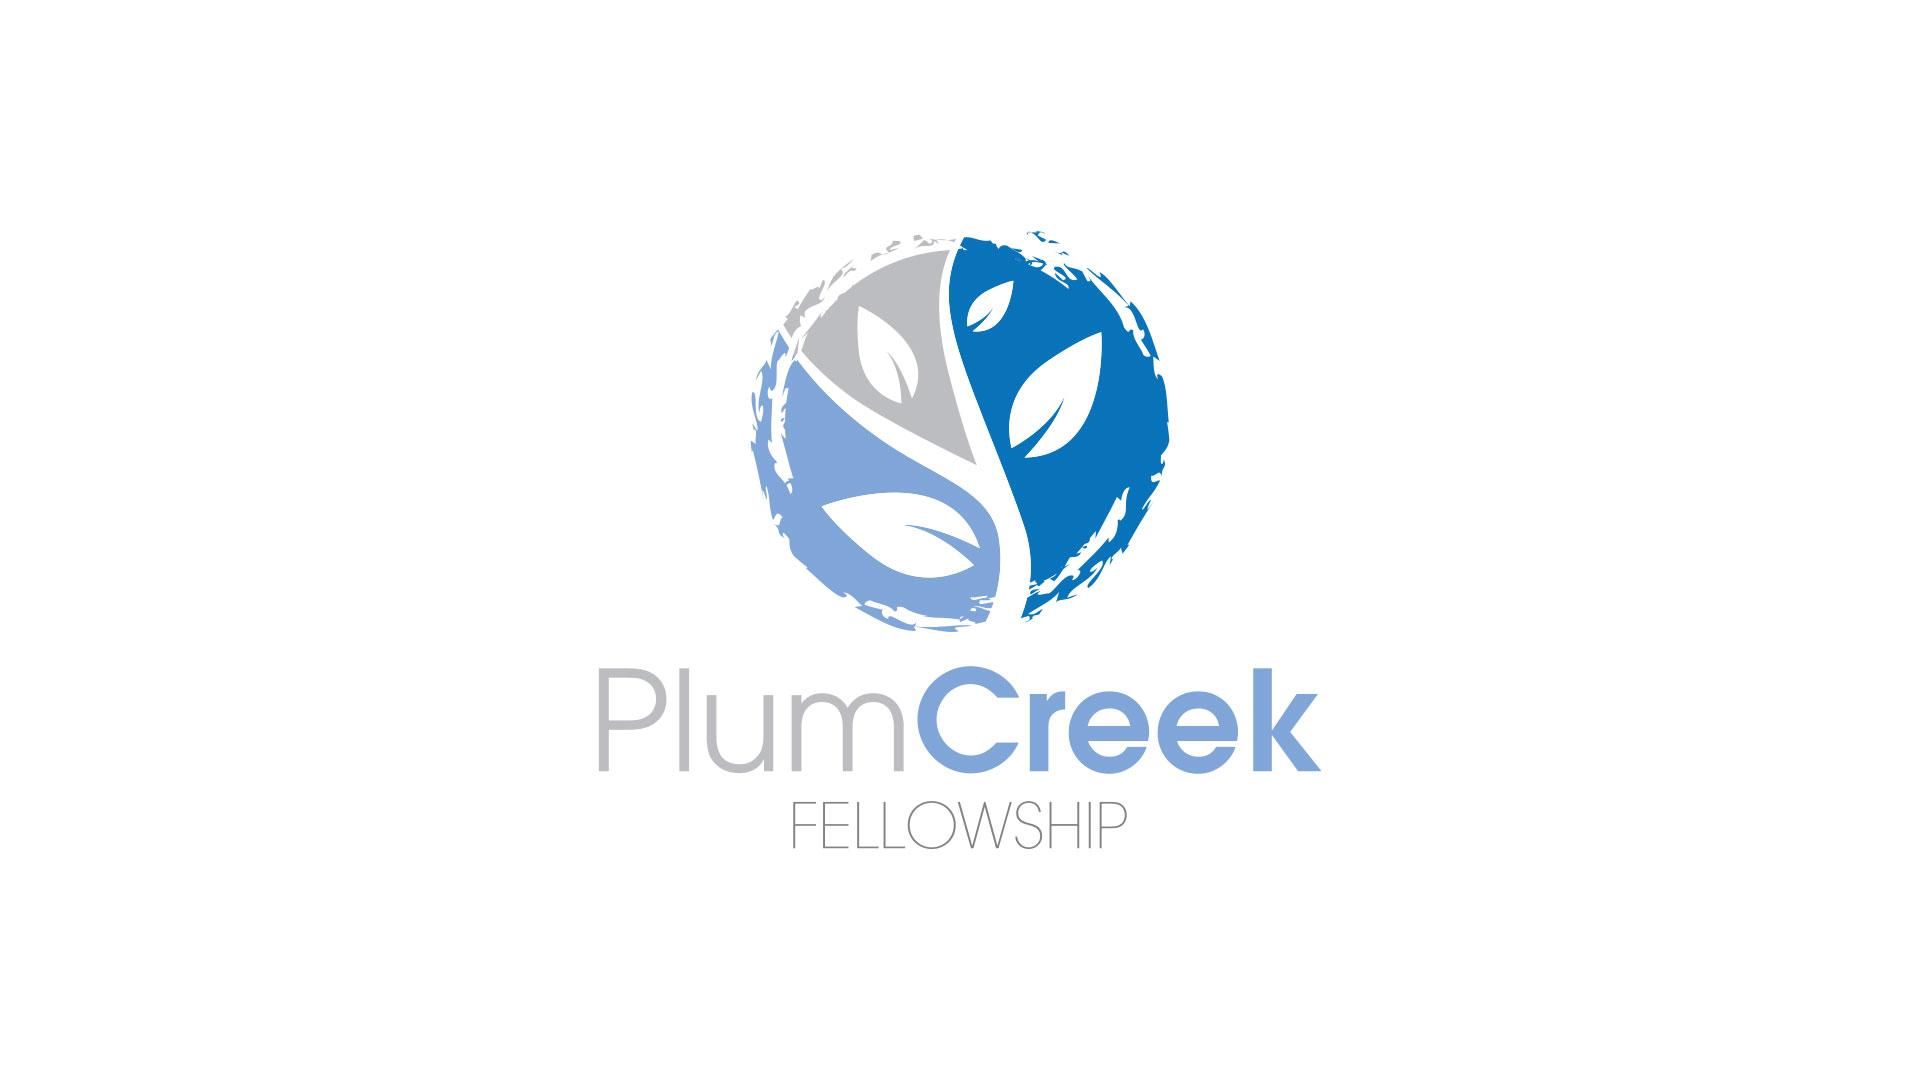 Plum Creek Fellowship | Shane Harris